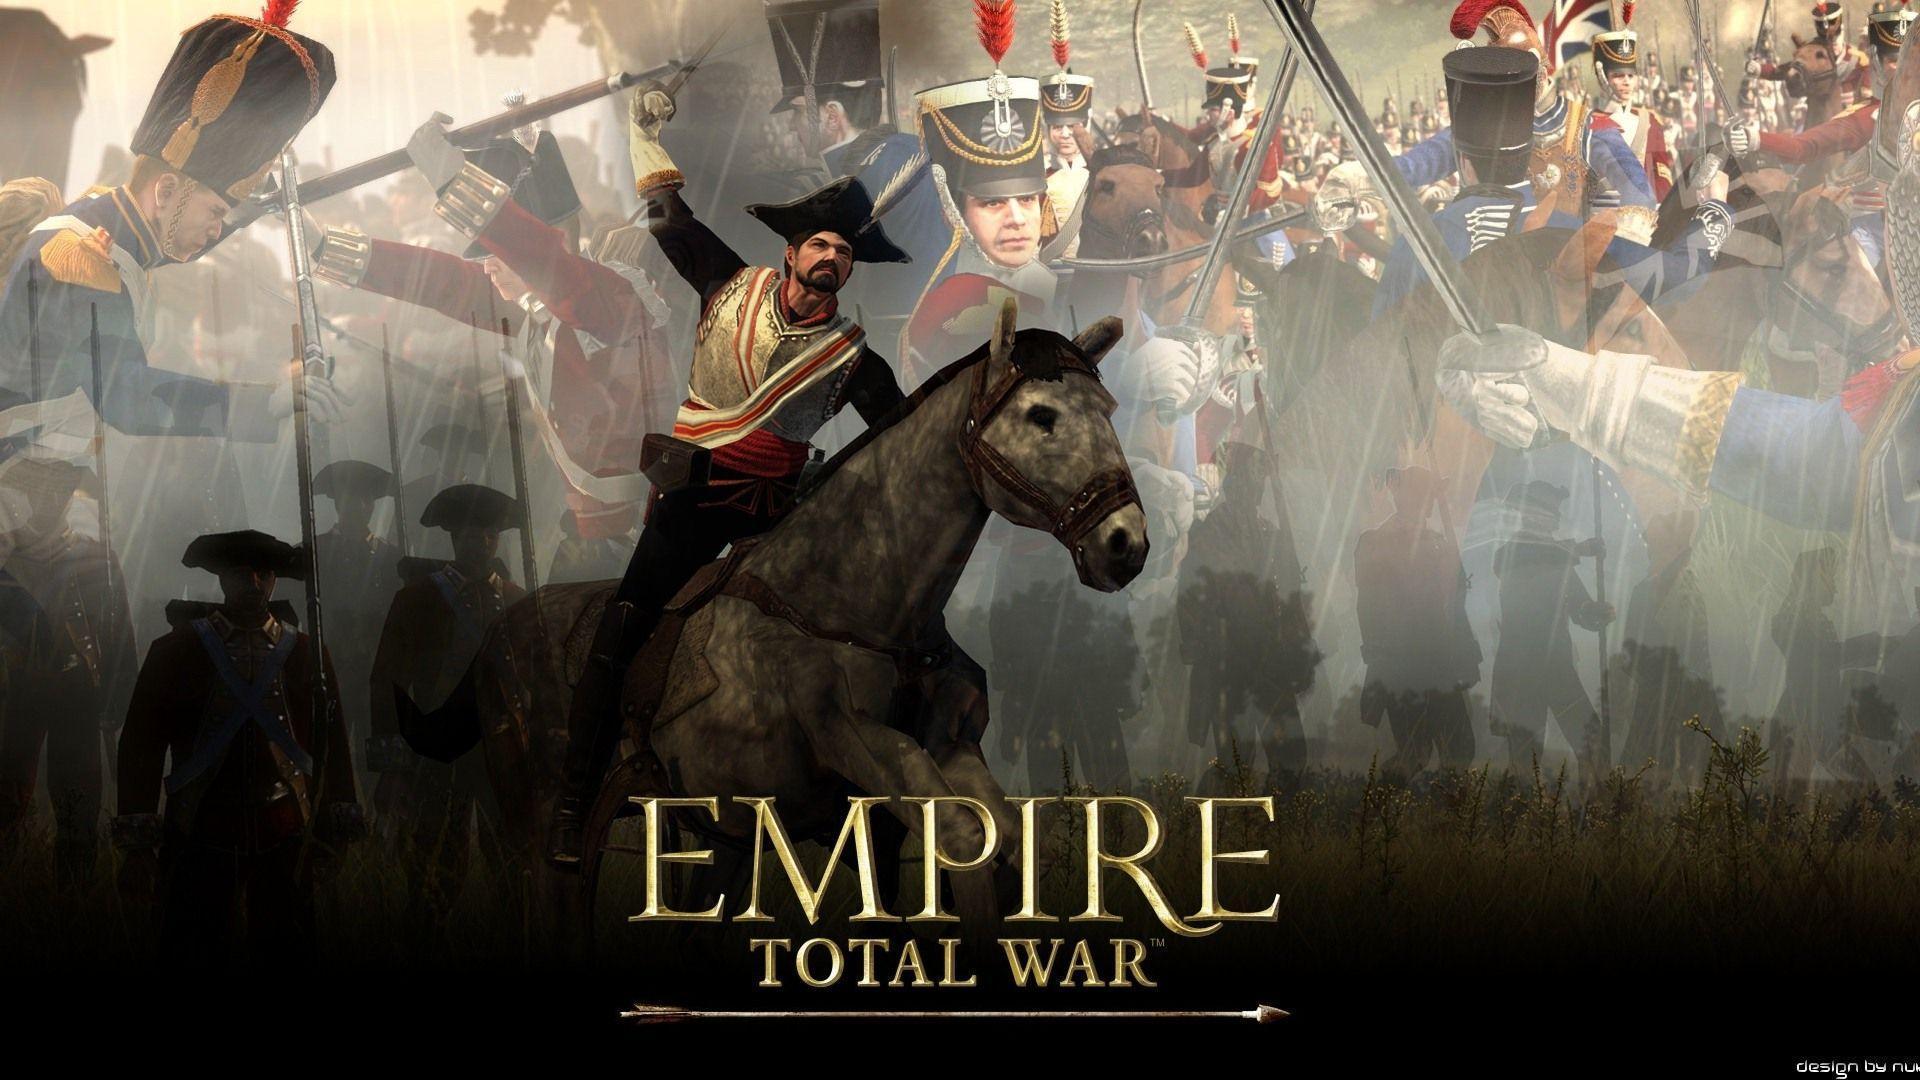 Empire Total War Wallpapers 1920x1080